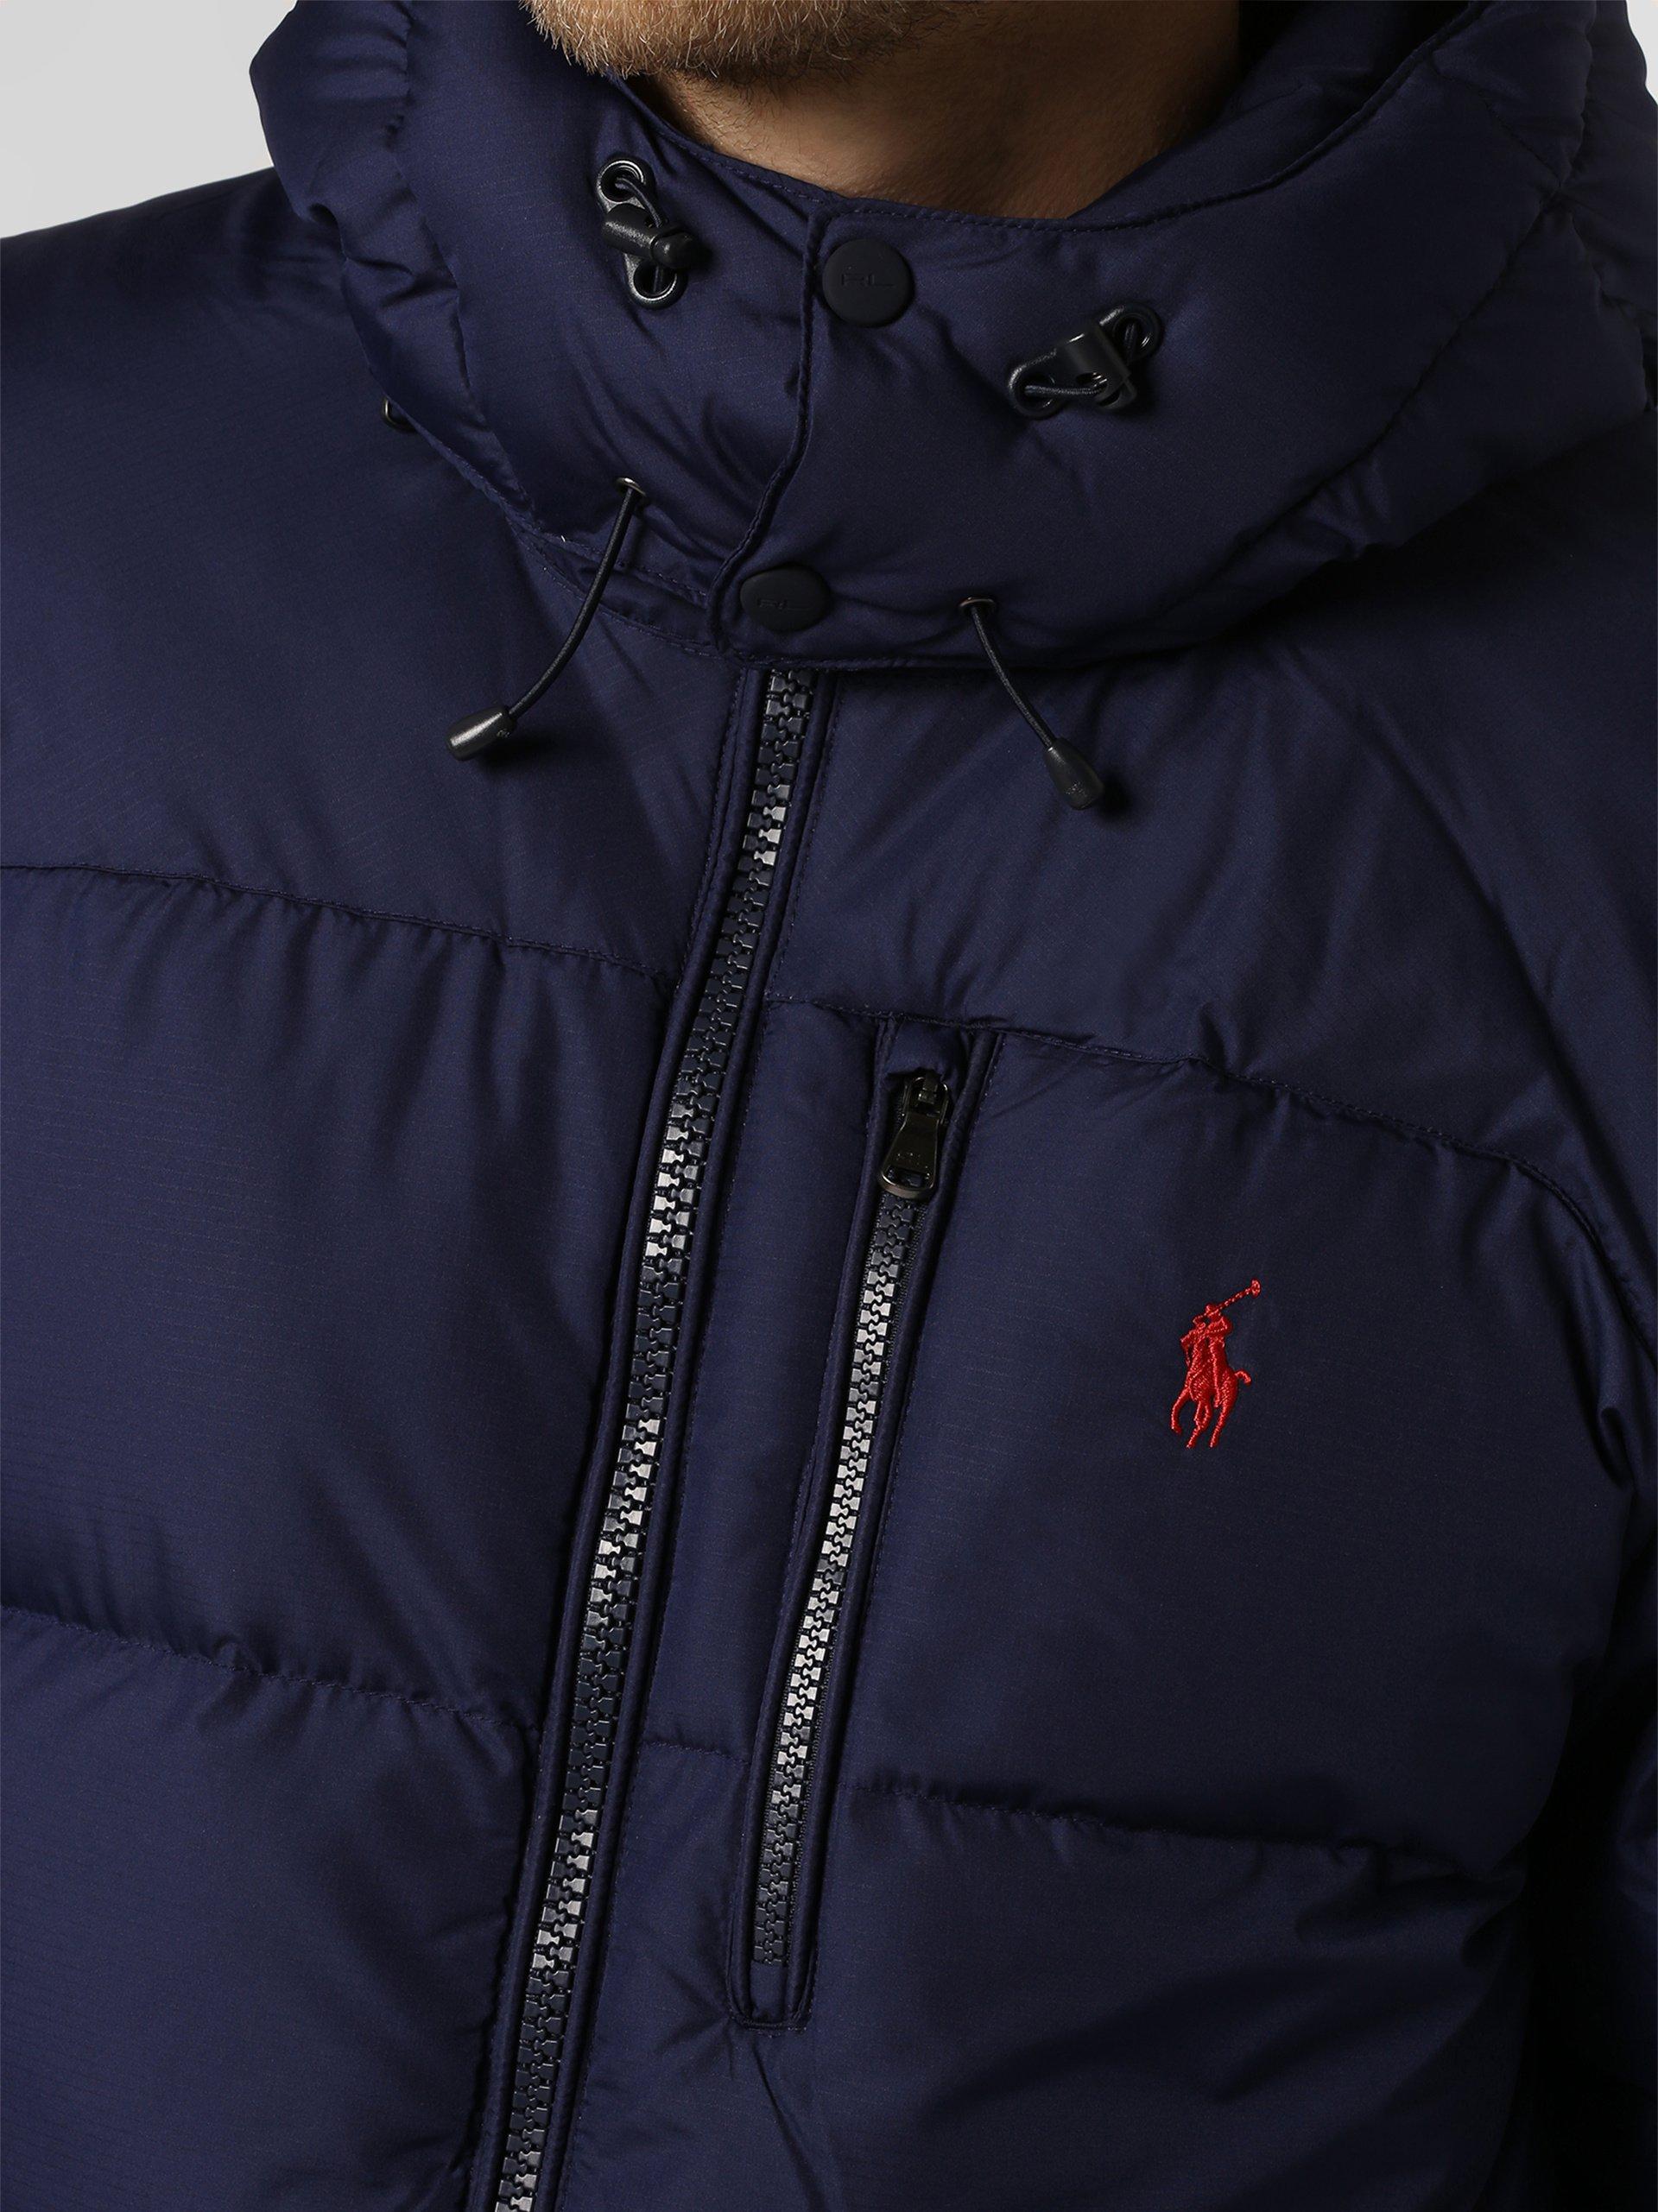 Polo Ralph Lauren Męska kurtka puchowa